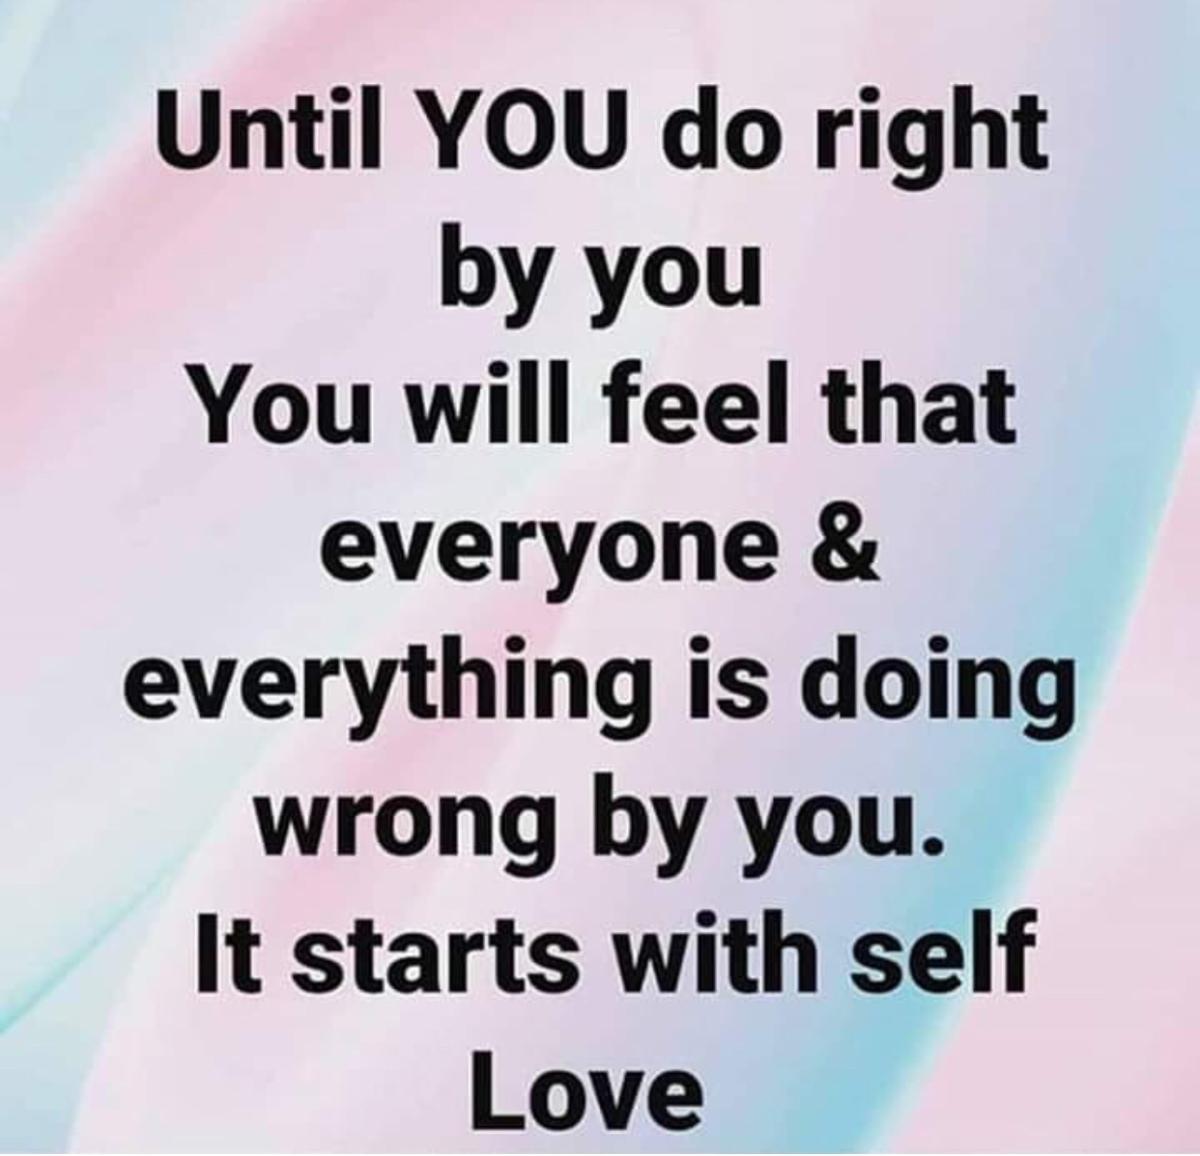 Self-Love is Self-Preservation